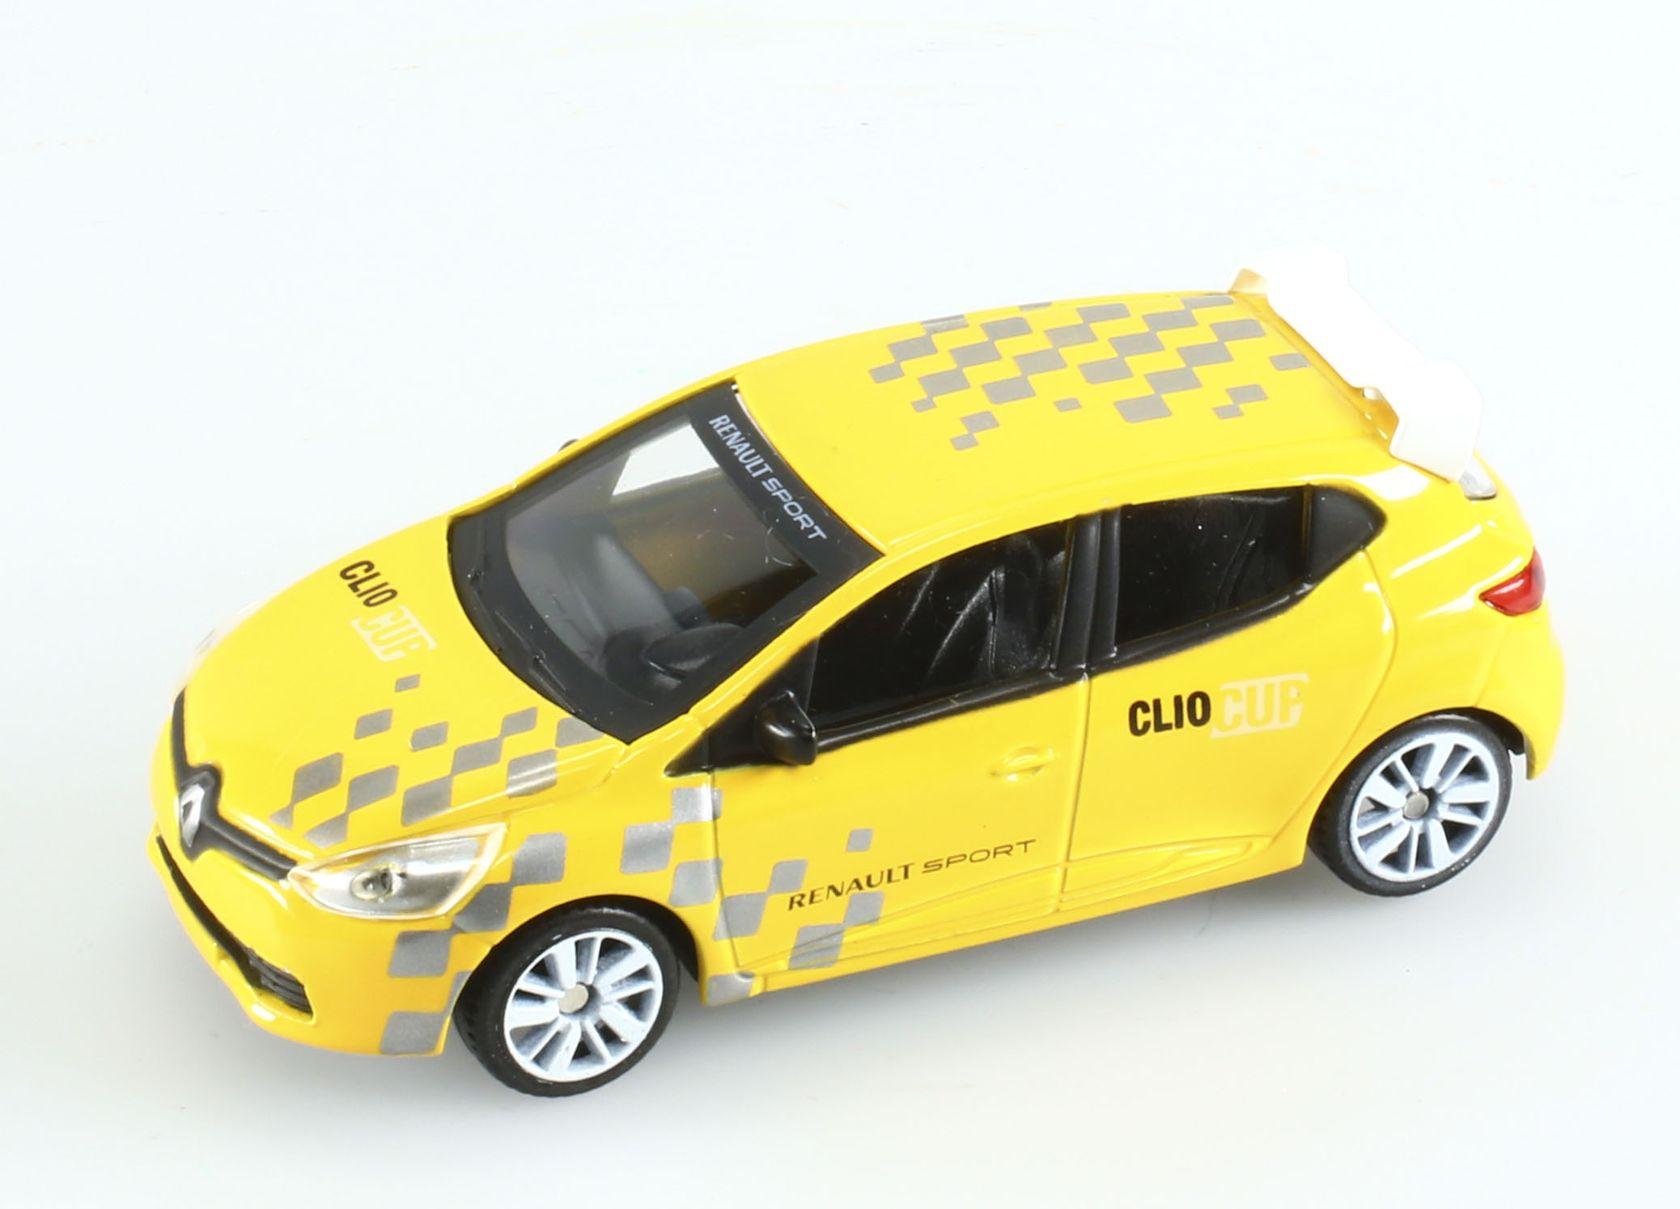 voiture de rallye miniature renault clio iv rs cup 1 43 ebay. Black Bedroom Furniture Sets. Home Design Ideas